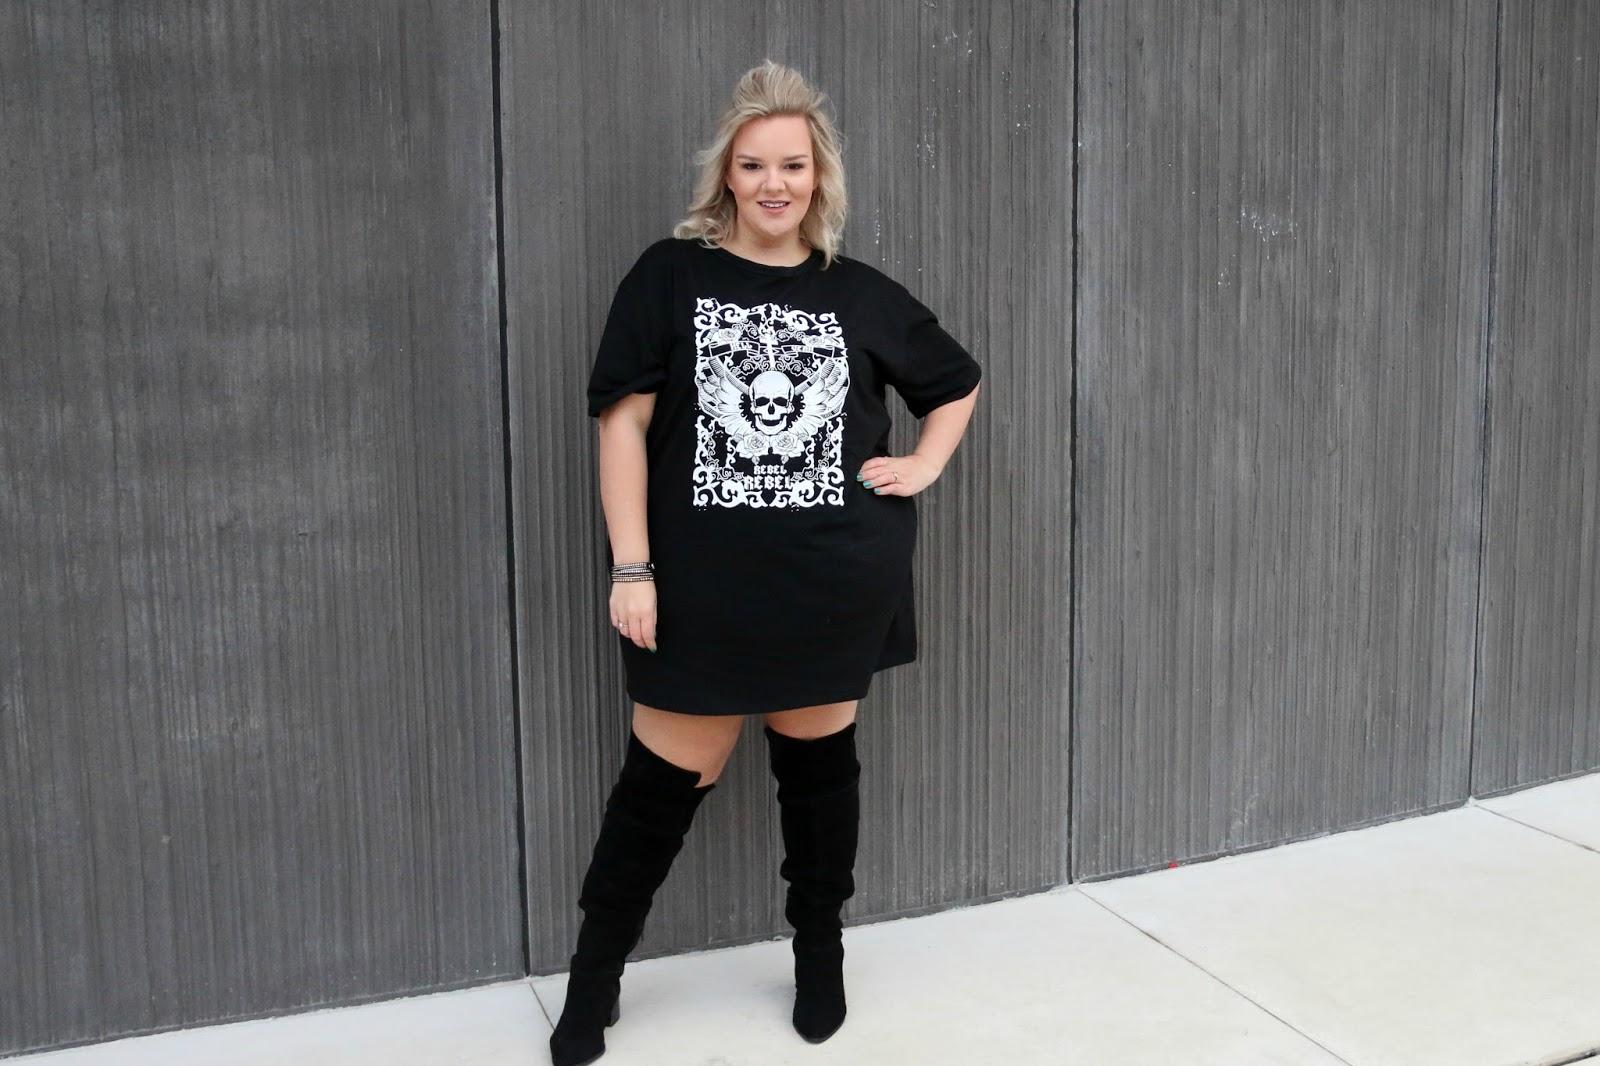 481f9c0ca53 In The Style Curve Charlotte Crosby Black Rebel Rebel Skull Oversized T  Shirt Dress on plus ...